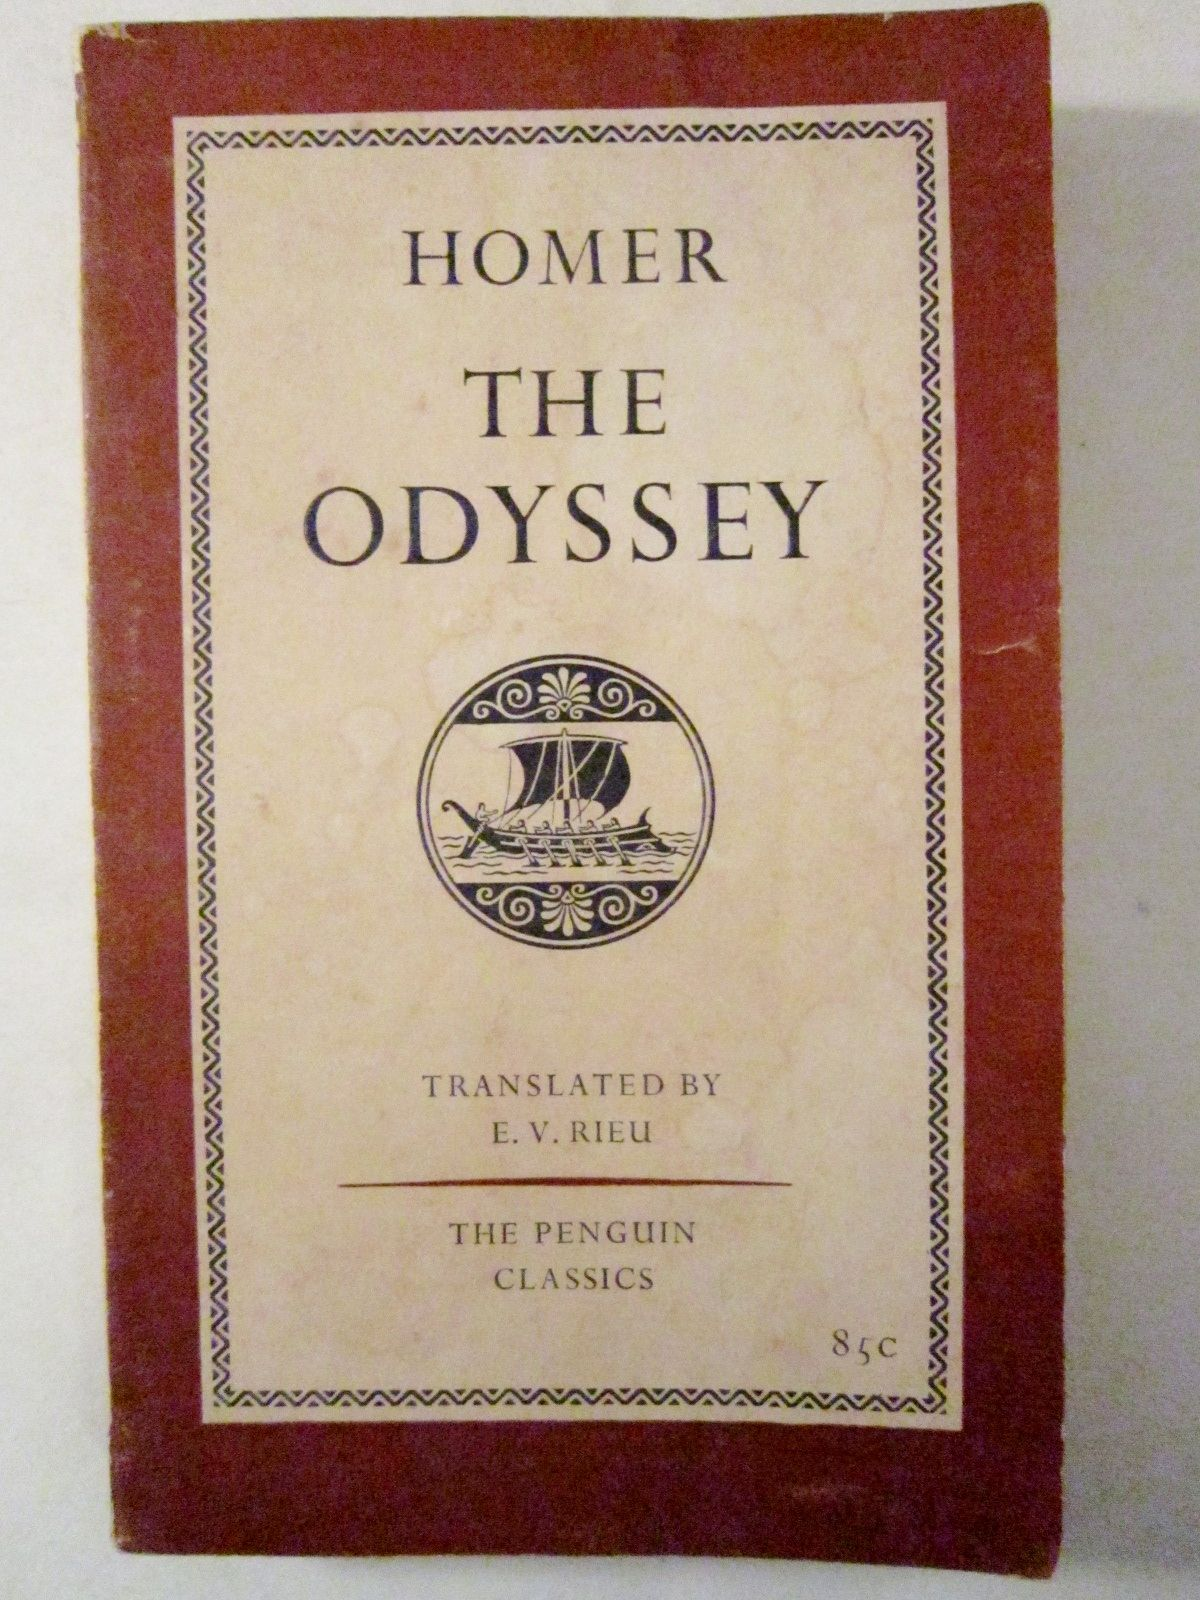 The Odyssey By Homer Translated By E V Rieu 1961 Penguin Classics